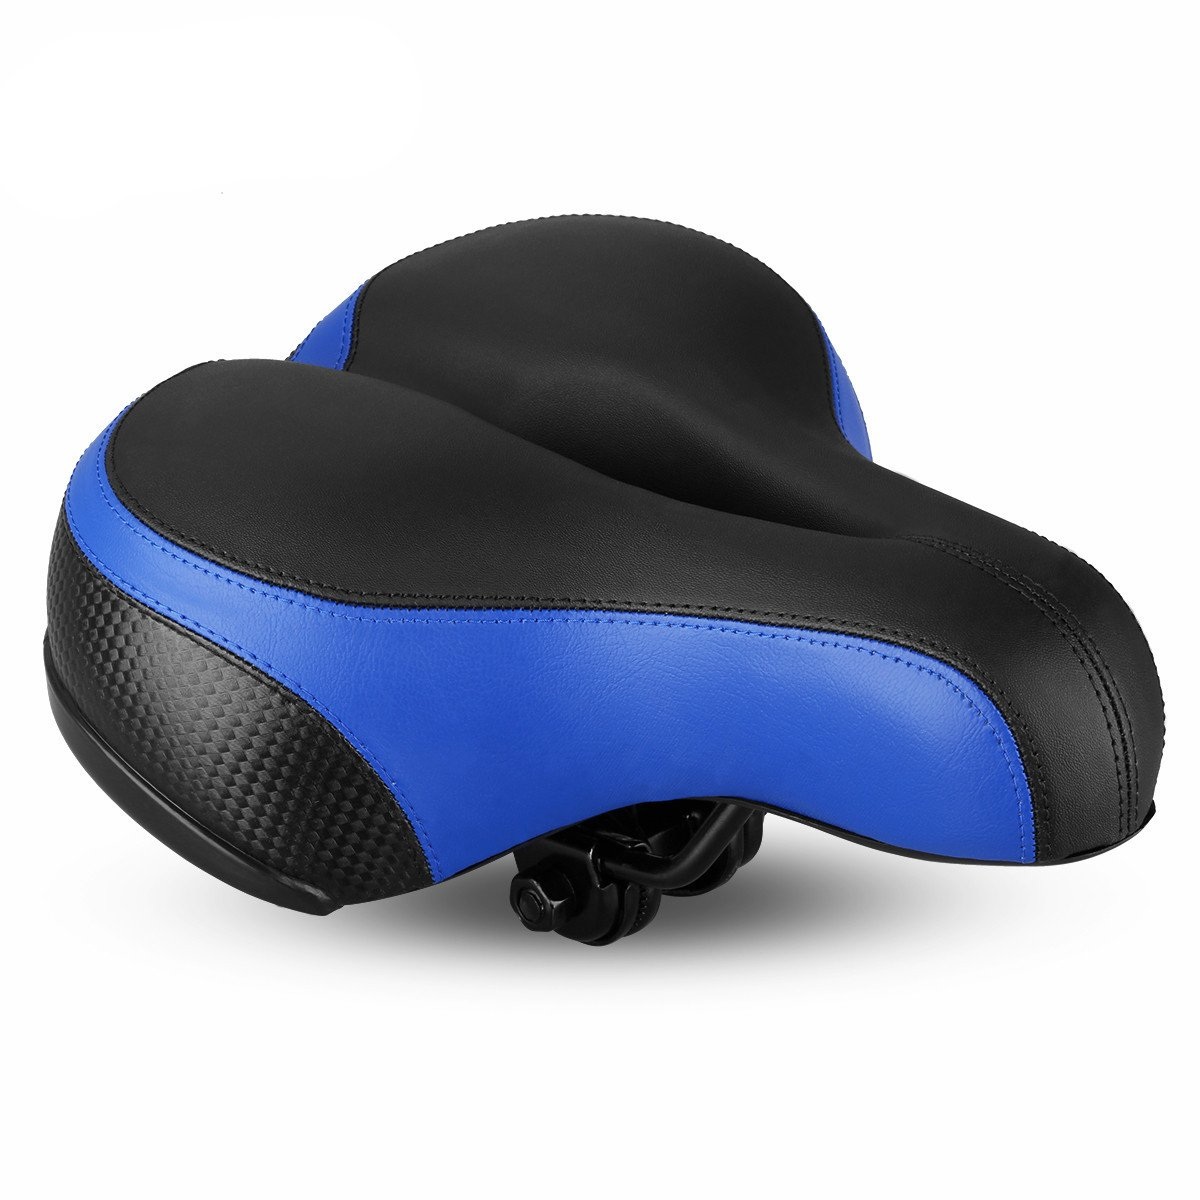 UPANBIKE Bike Saddle Shock Absorption Ultra-thick Soft Comfortable Bicycle Seat For Mountain Bike Road Bike